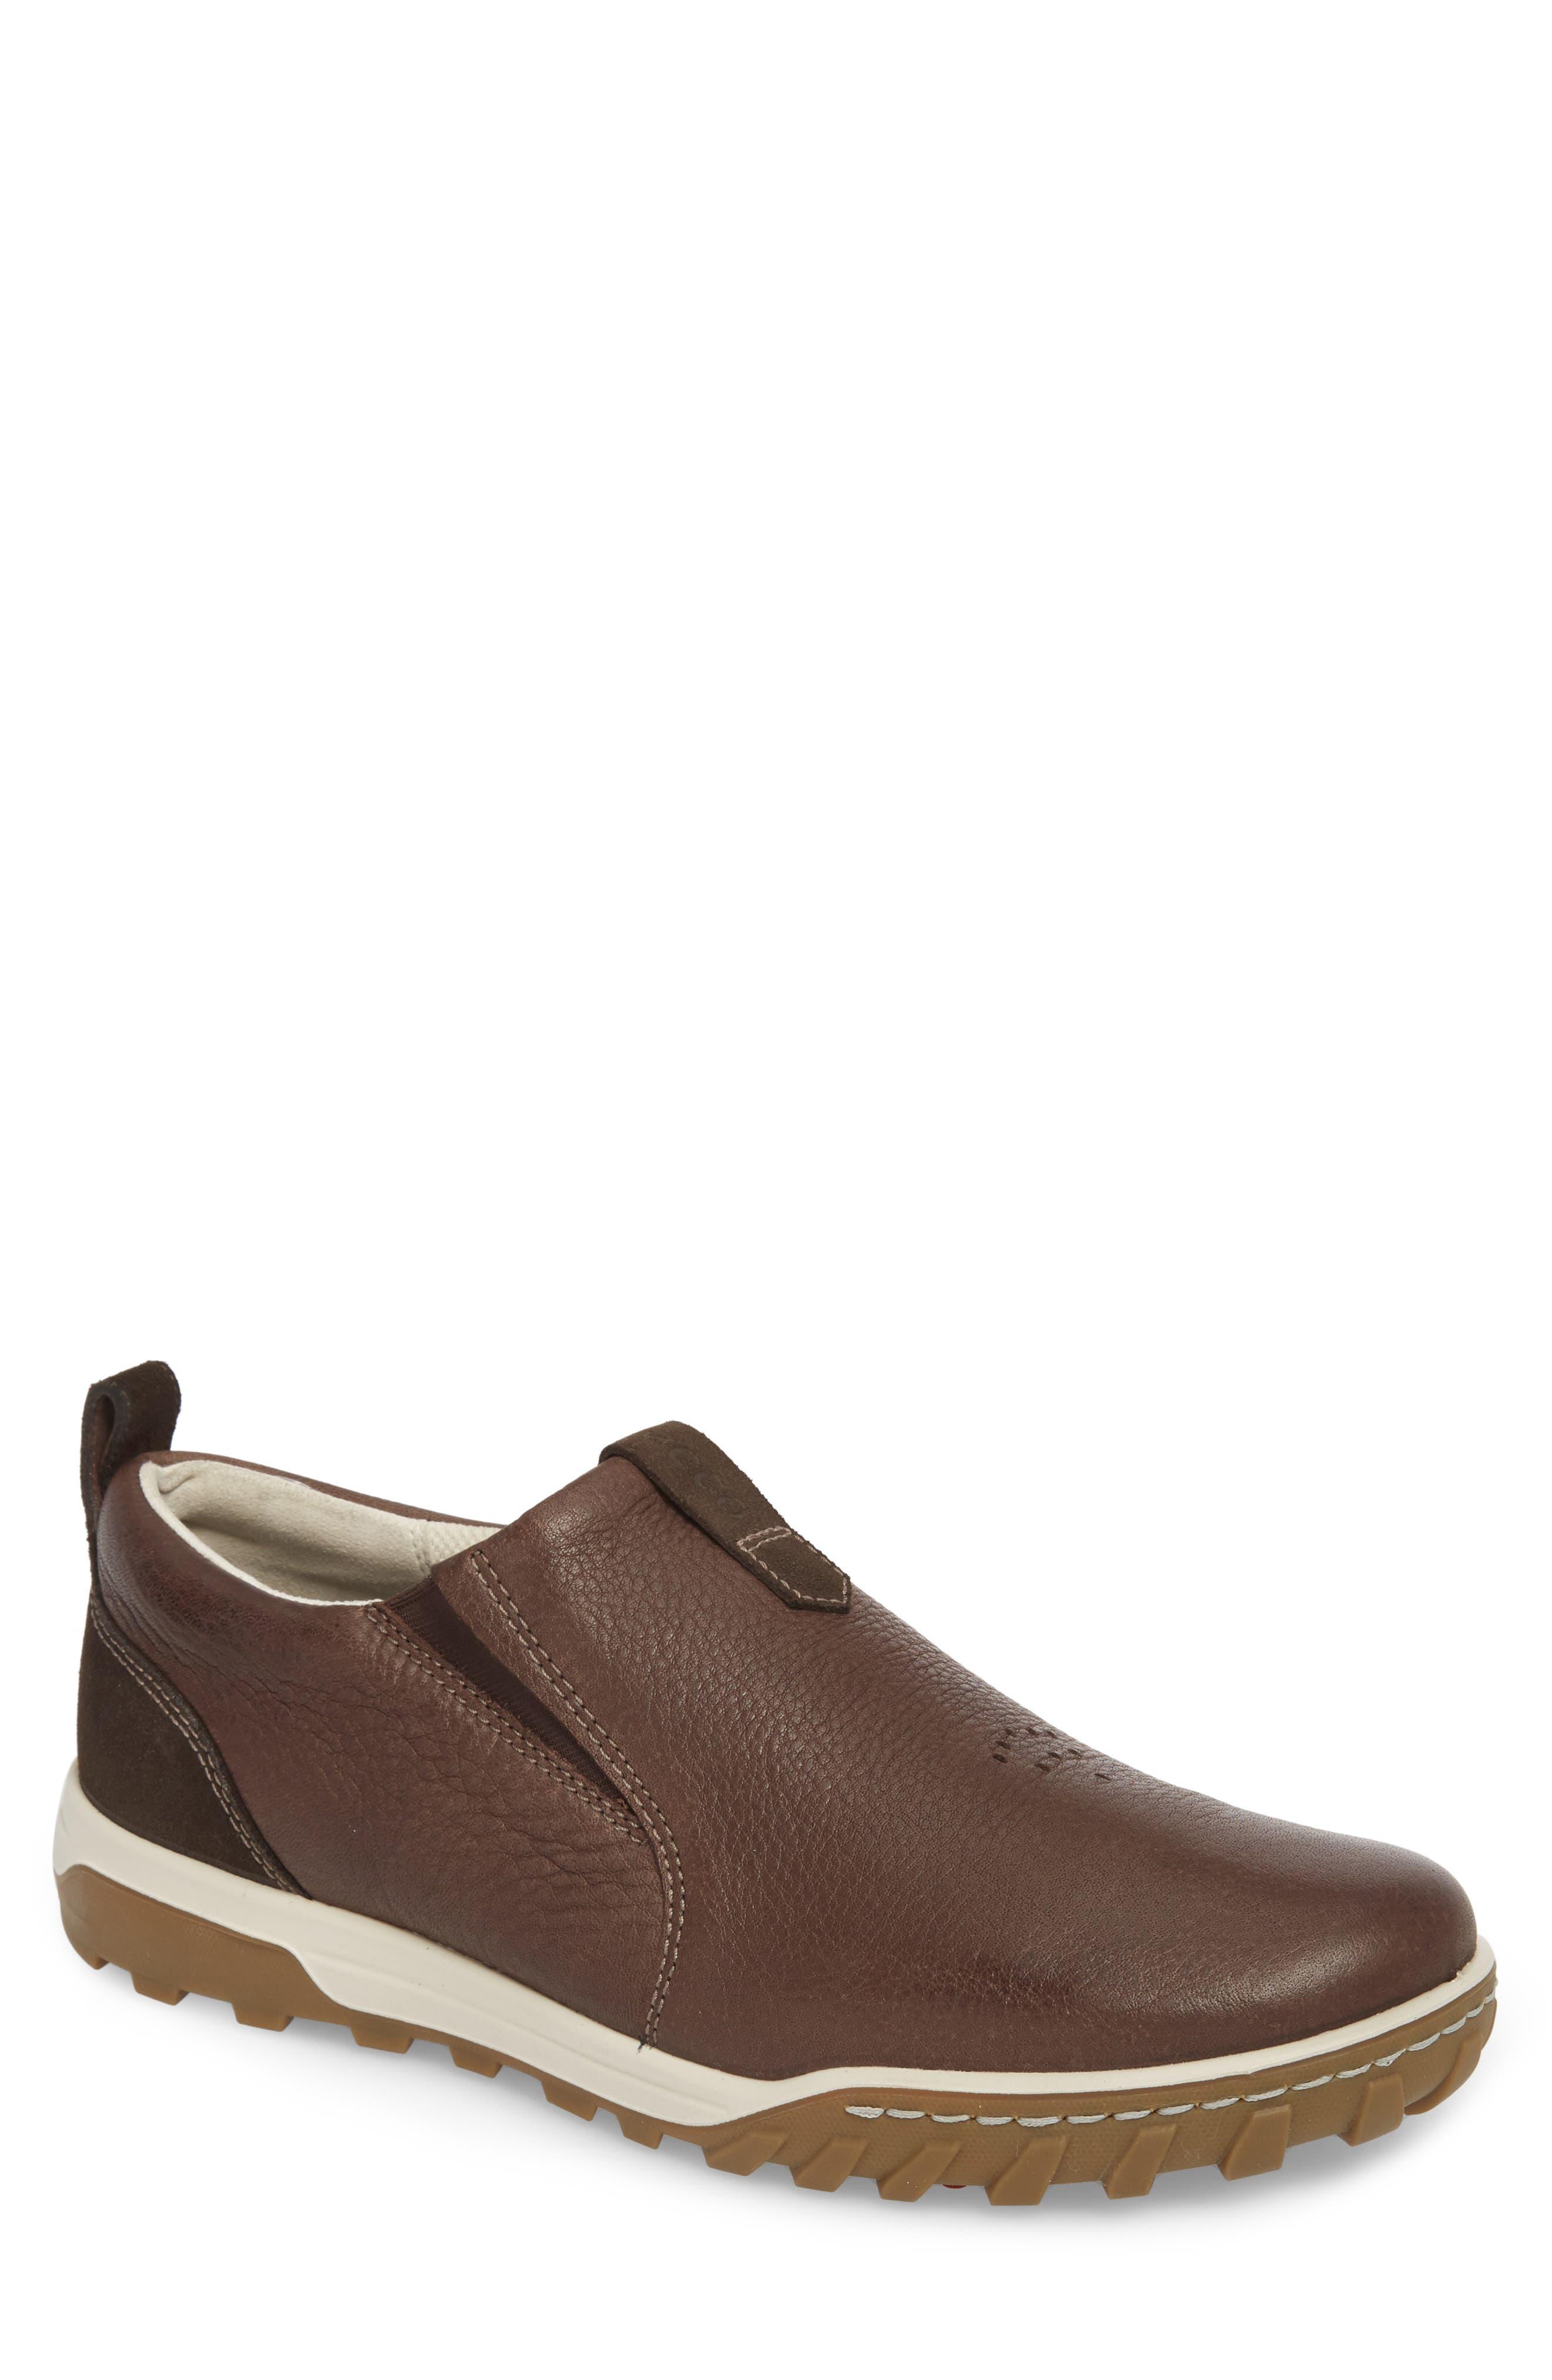 Urban Lifestyle Slip-On Sneaker,                         Main,                         color, 206